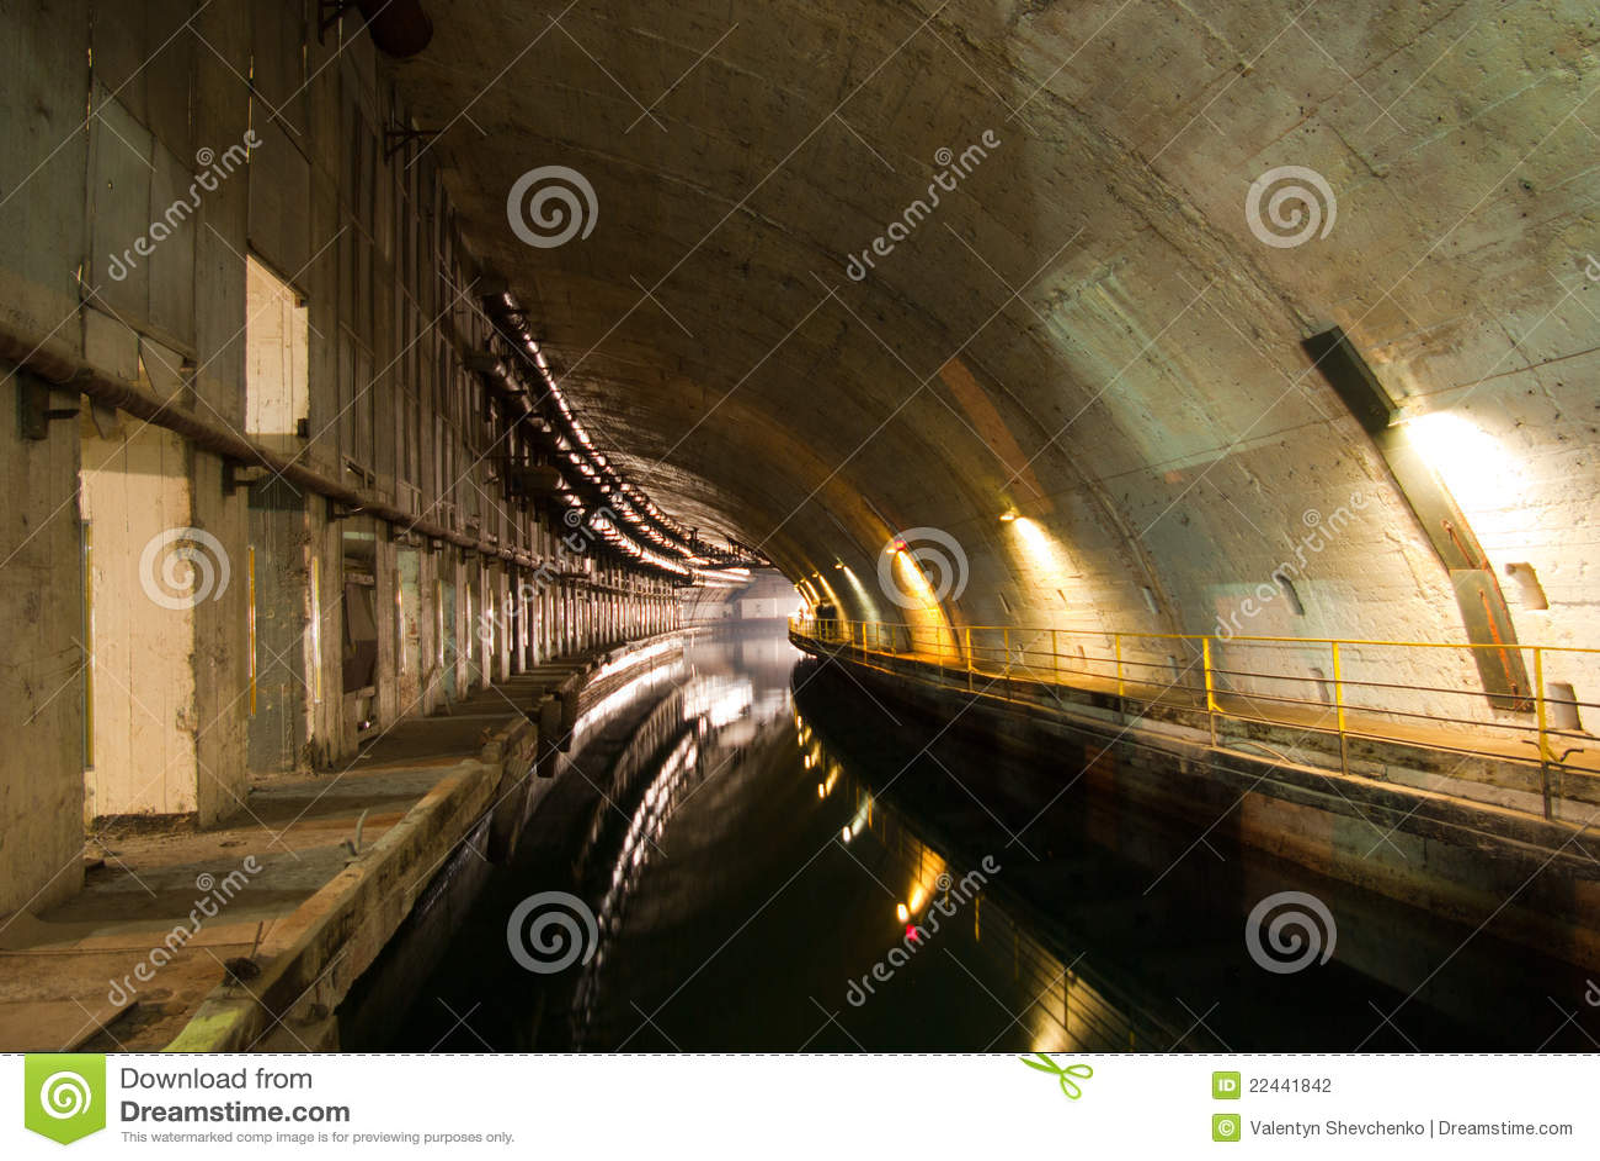 Militärunterwasserreparatur Dockage